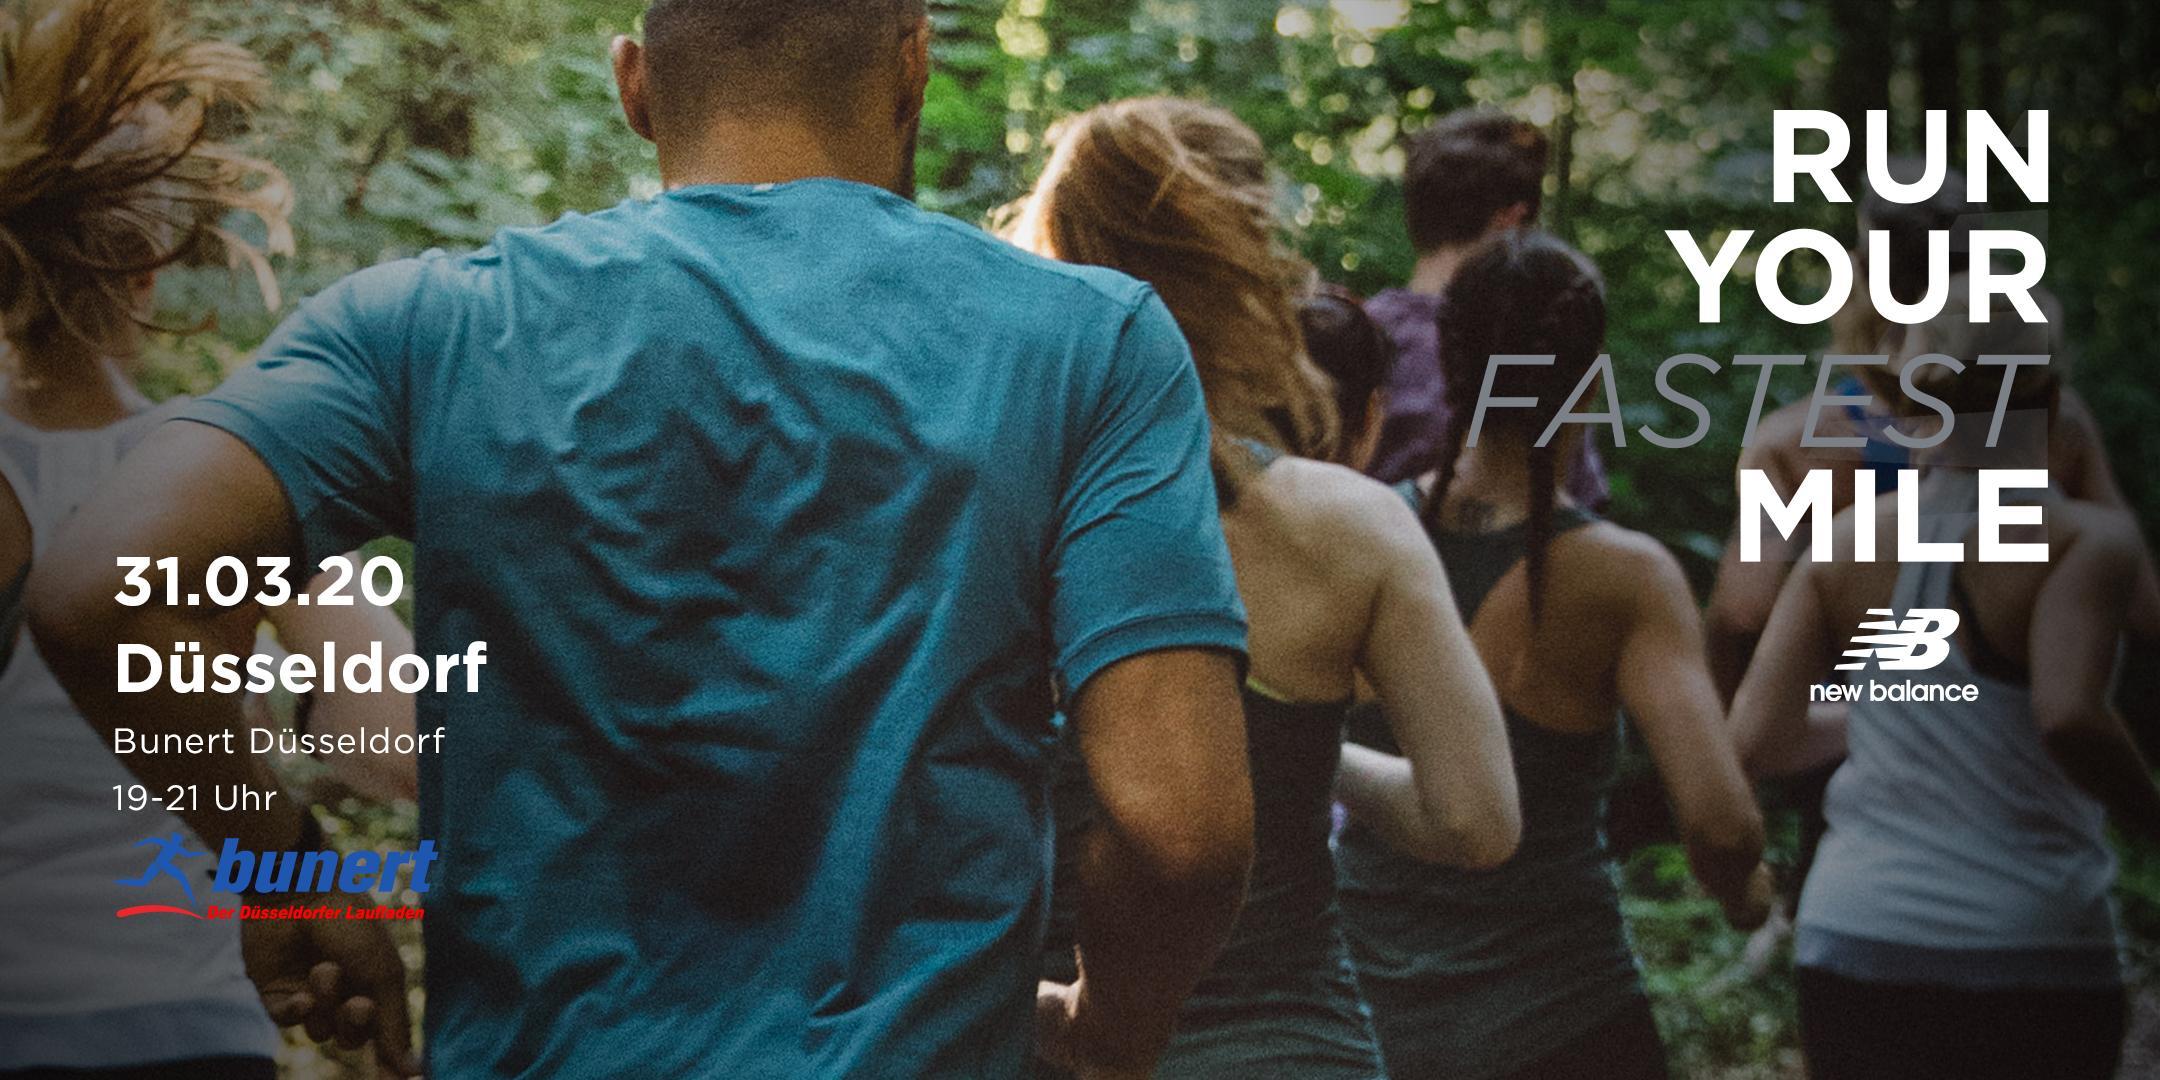 New Balance Run Your Fastest Mile-Event / Laufsport Bunert Düsseldorf